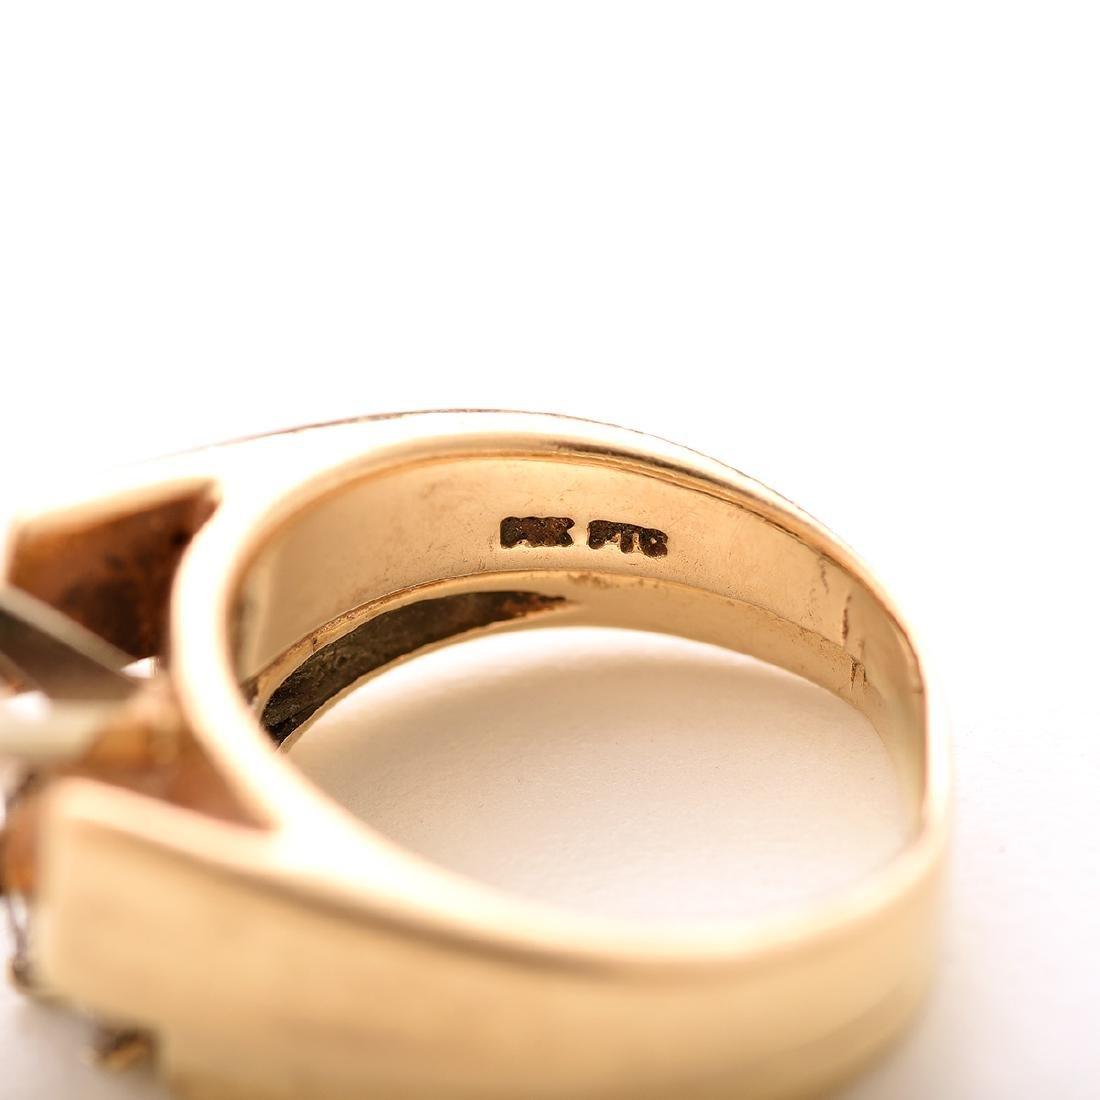 Diamond, 14k Yellow Gold Wedding Ring Set. - 4